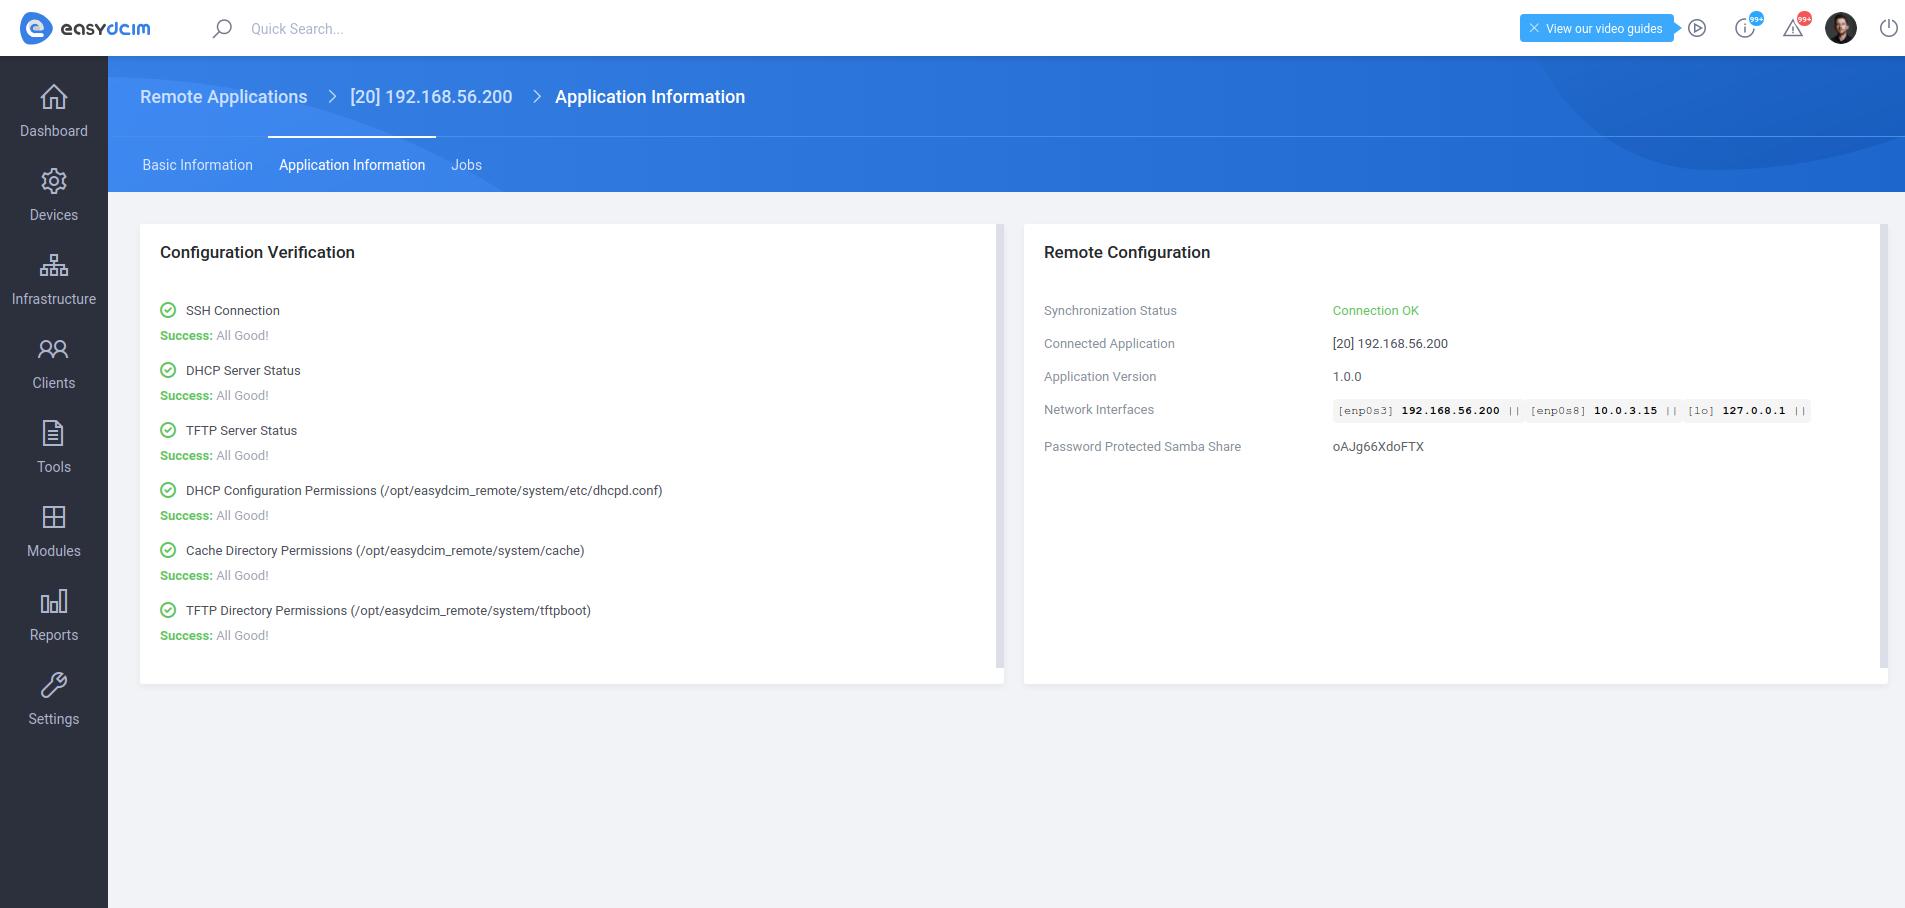 Remote Applications Verification Status - EasyDCIM v1.5.3